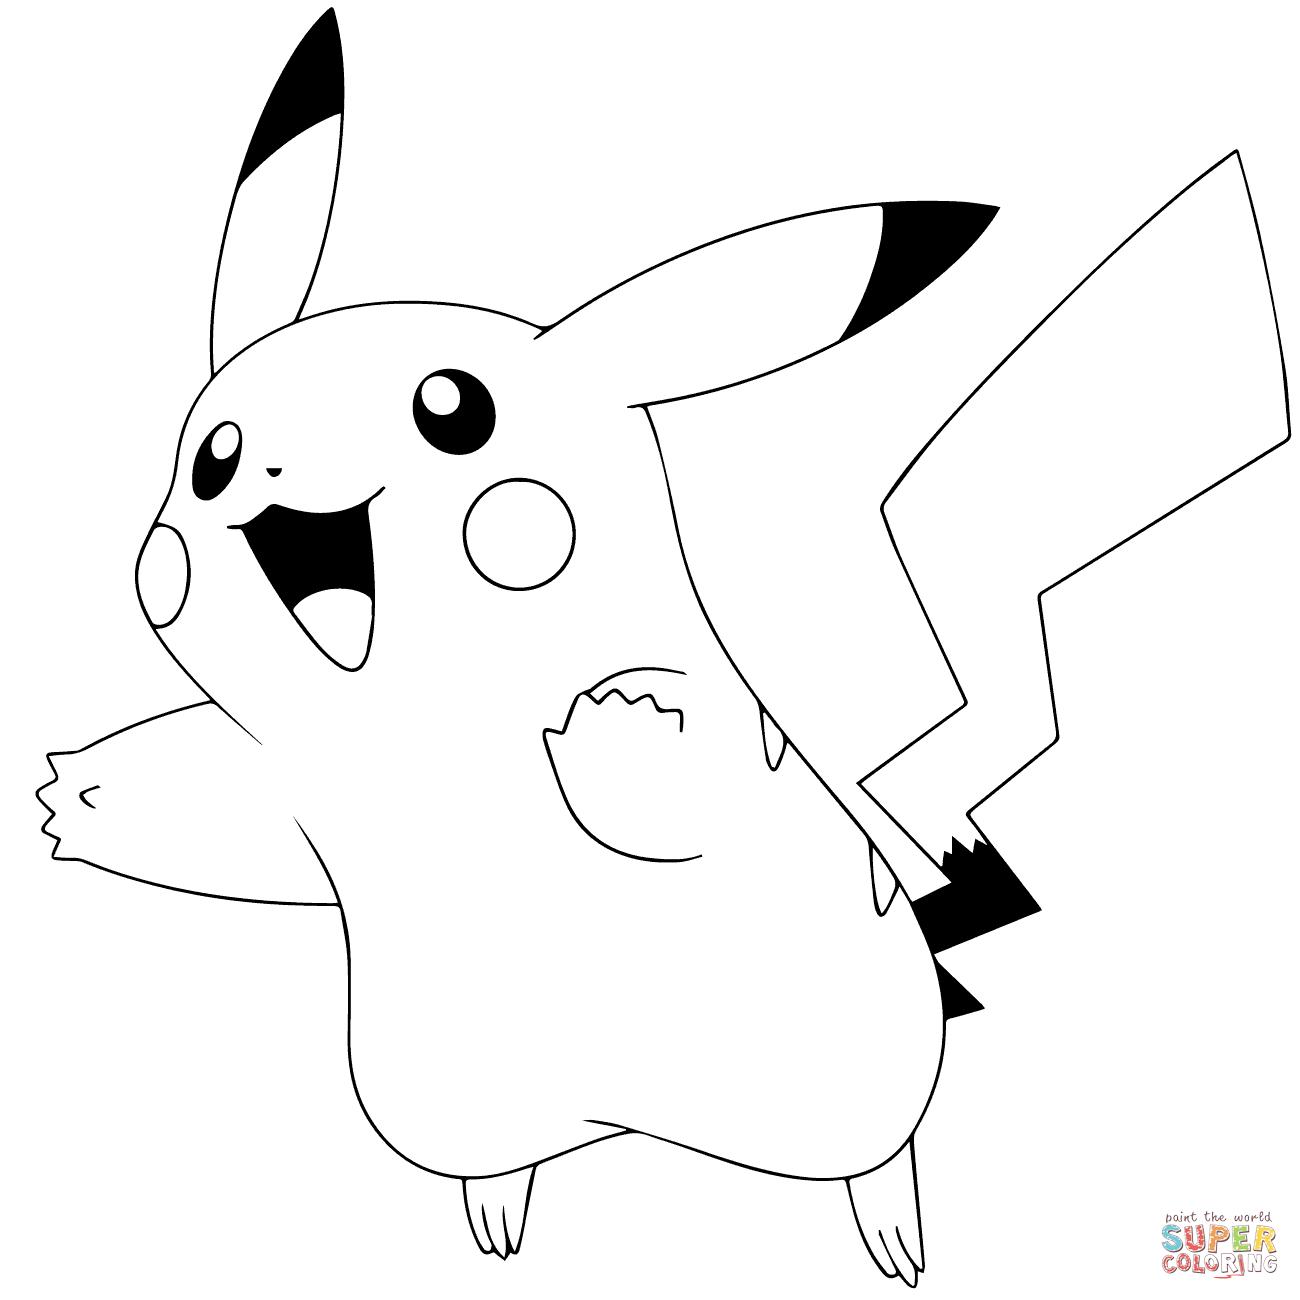 Pok mon go pikachu 025